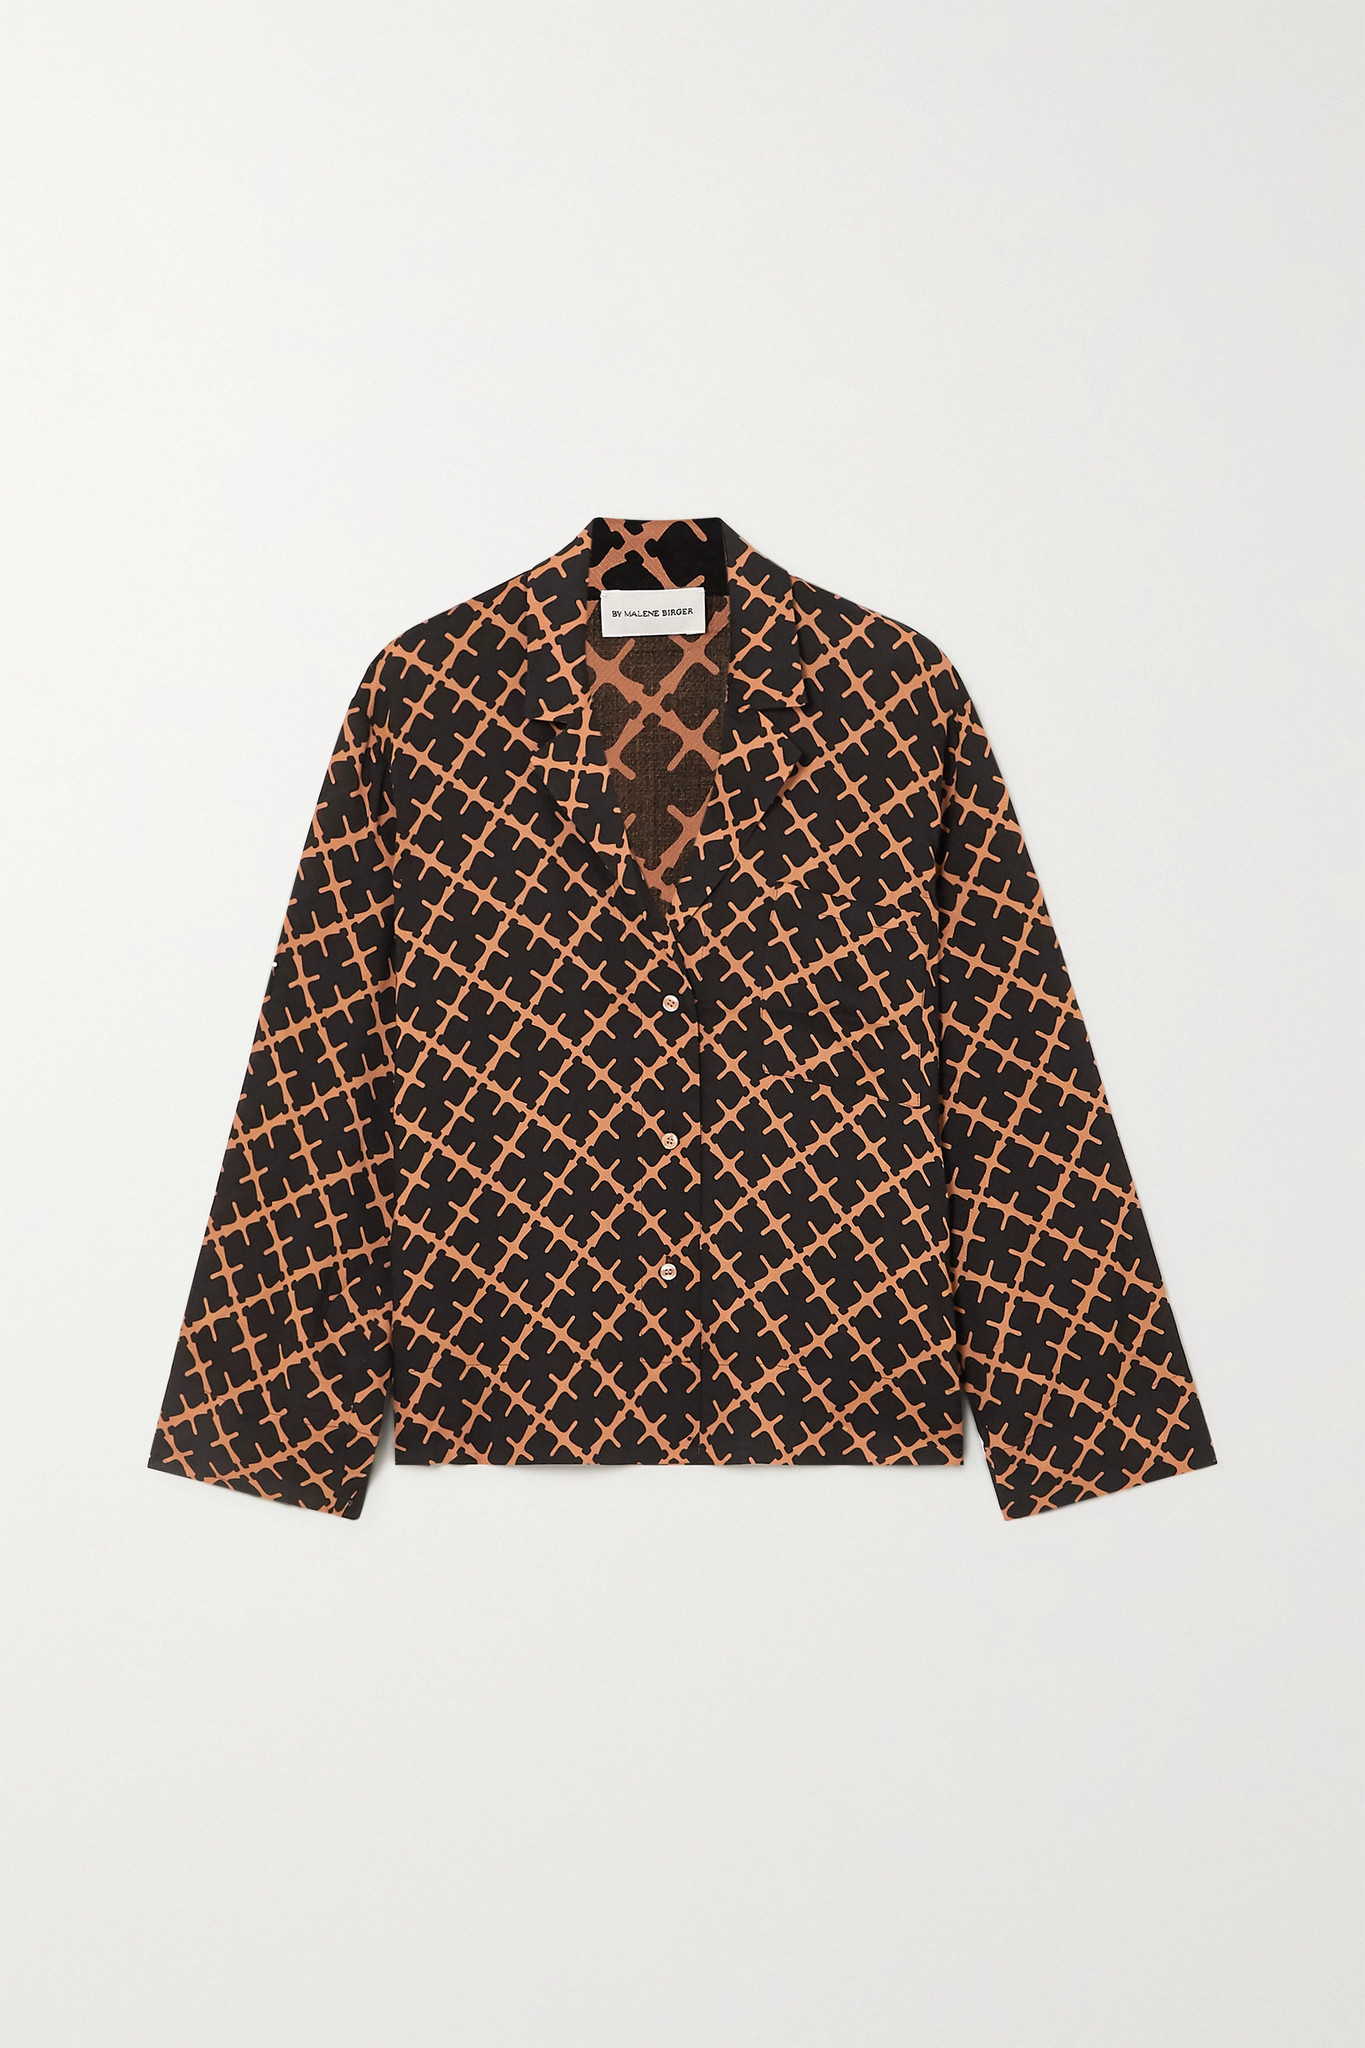 BY MALENE BIRGER - Osa 印花斜纹布衬衫 - 金属色 - DK44